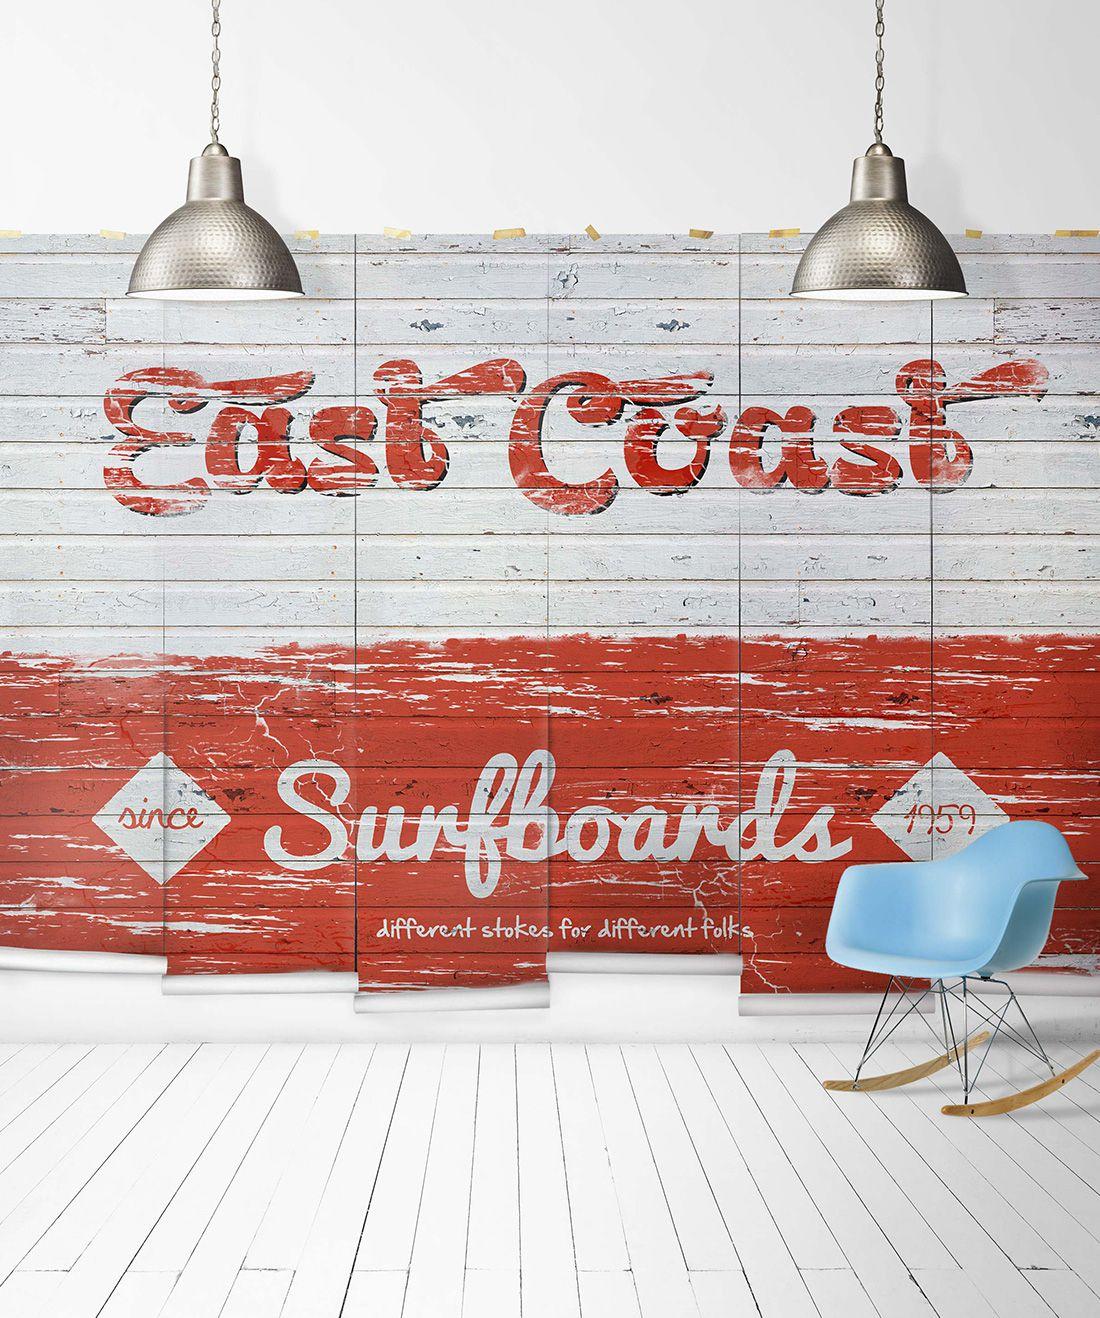 East Coast Surfboards Mural